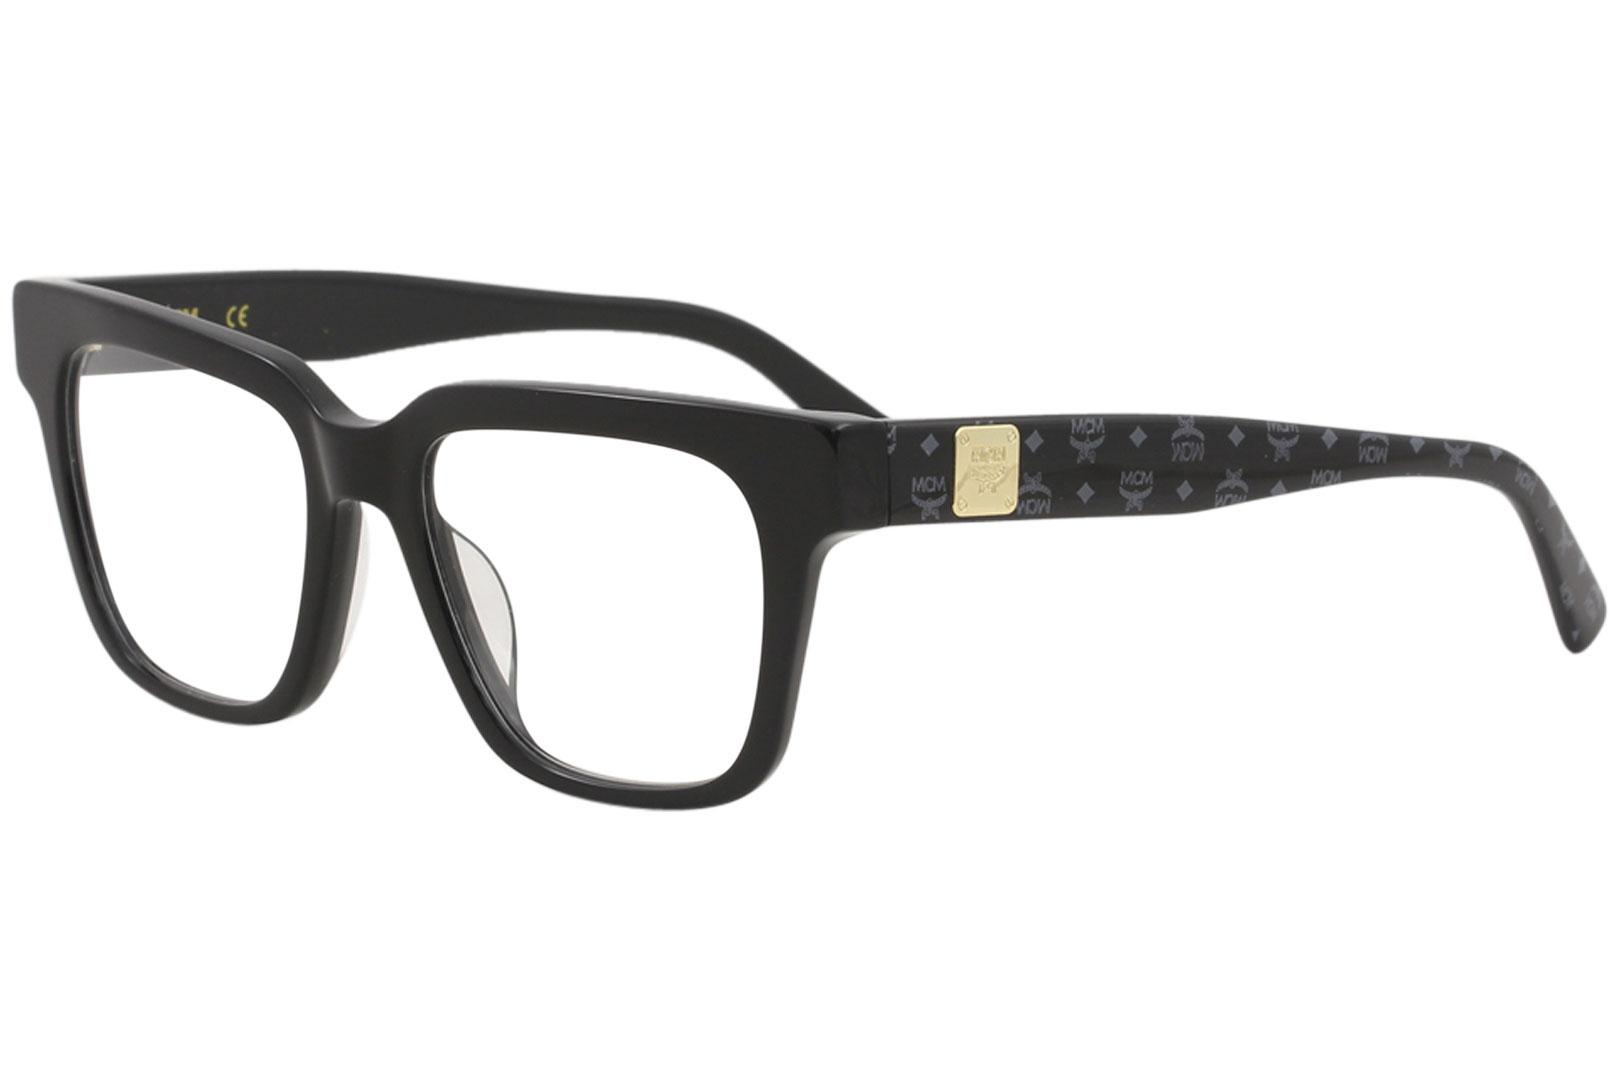 91ecda2c433 MCM Women s Eyeglasses MCM2618 MCM 2618 Full Rim Optical Frame